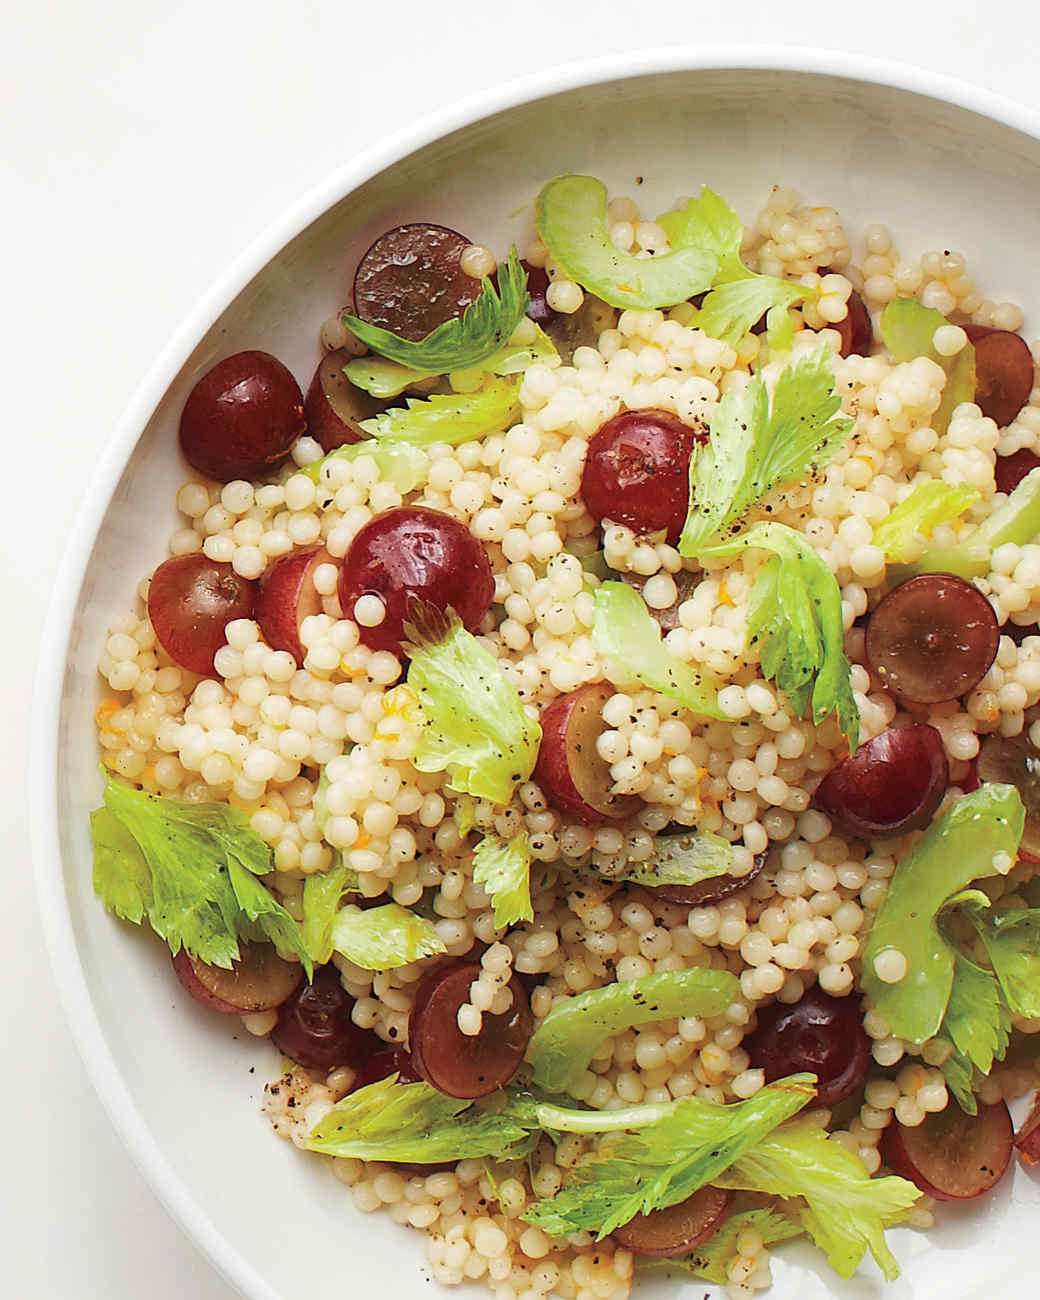 grape-celery-couscous-salad-med109135.jpg